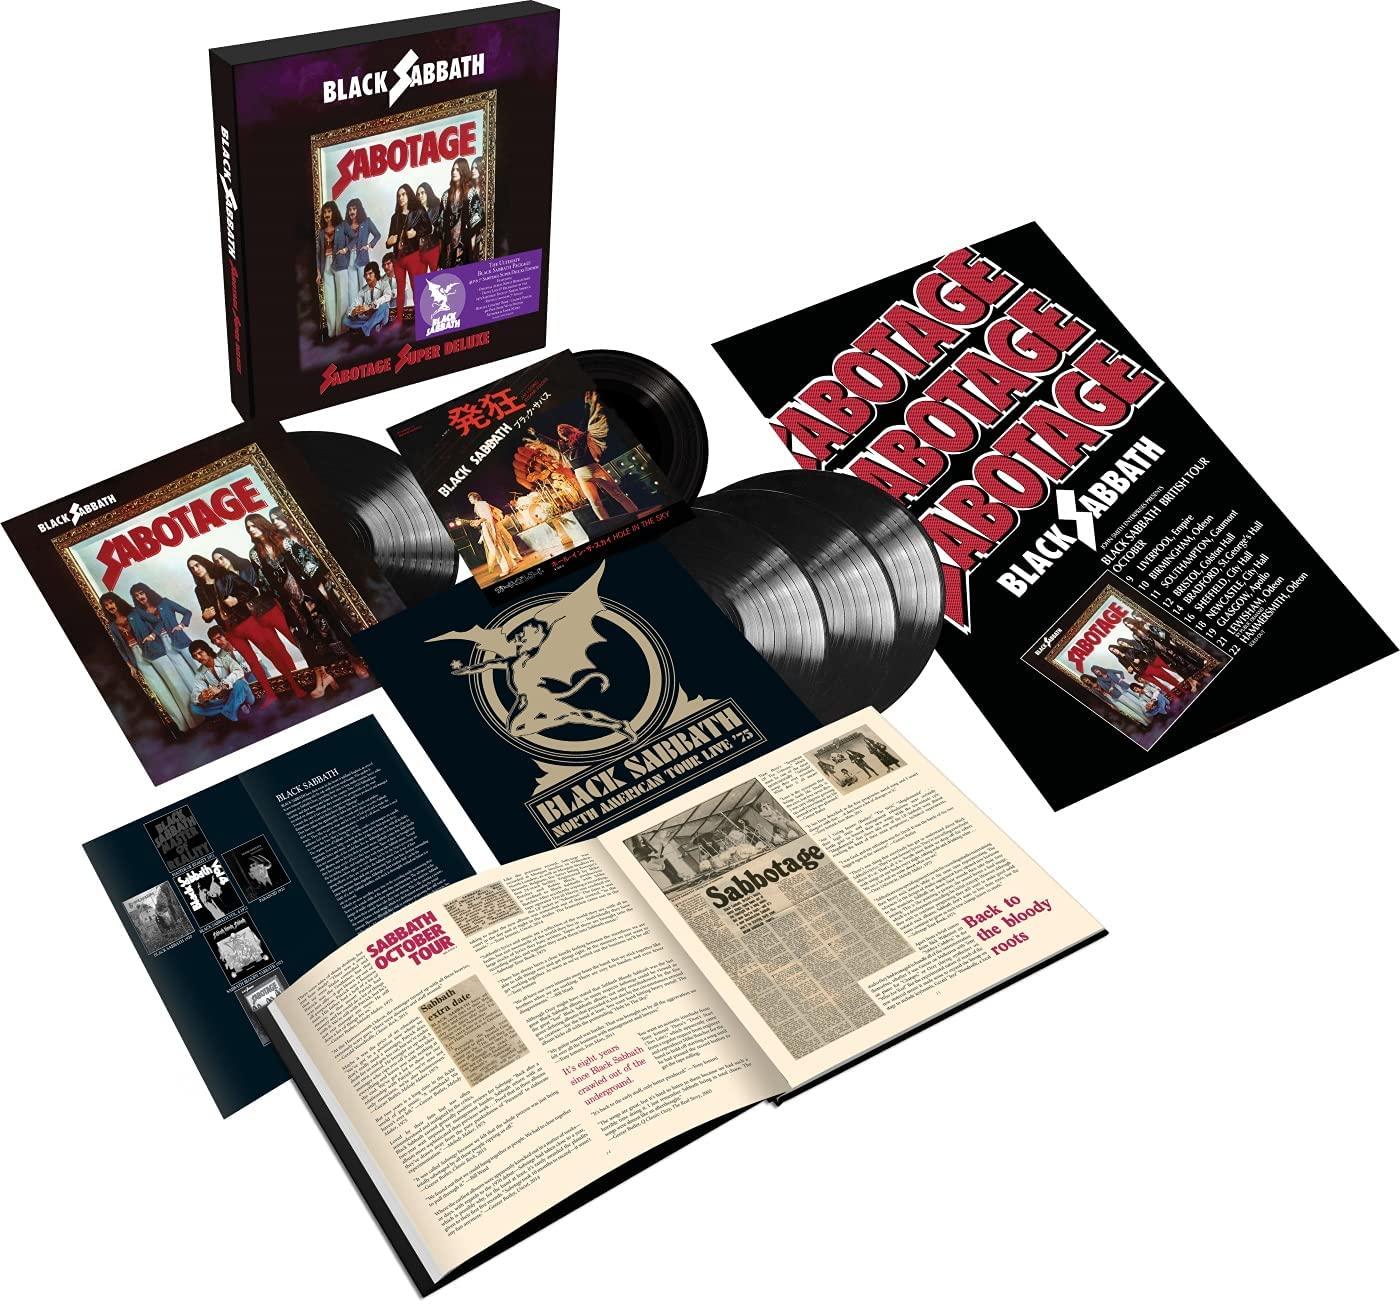 "Black Sabbath - Sabotage [BOX SET] (4xLP+7""+Poster+Book)"